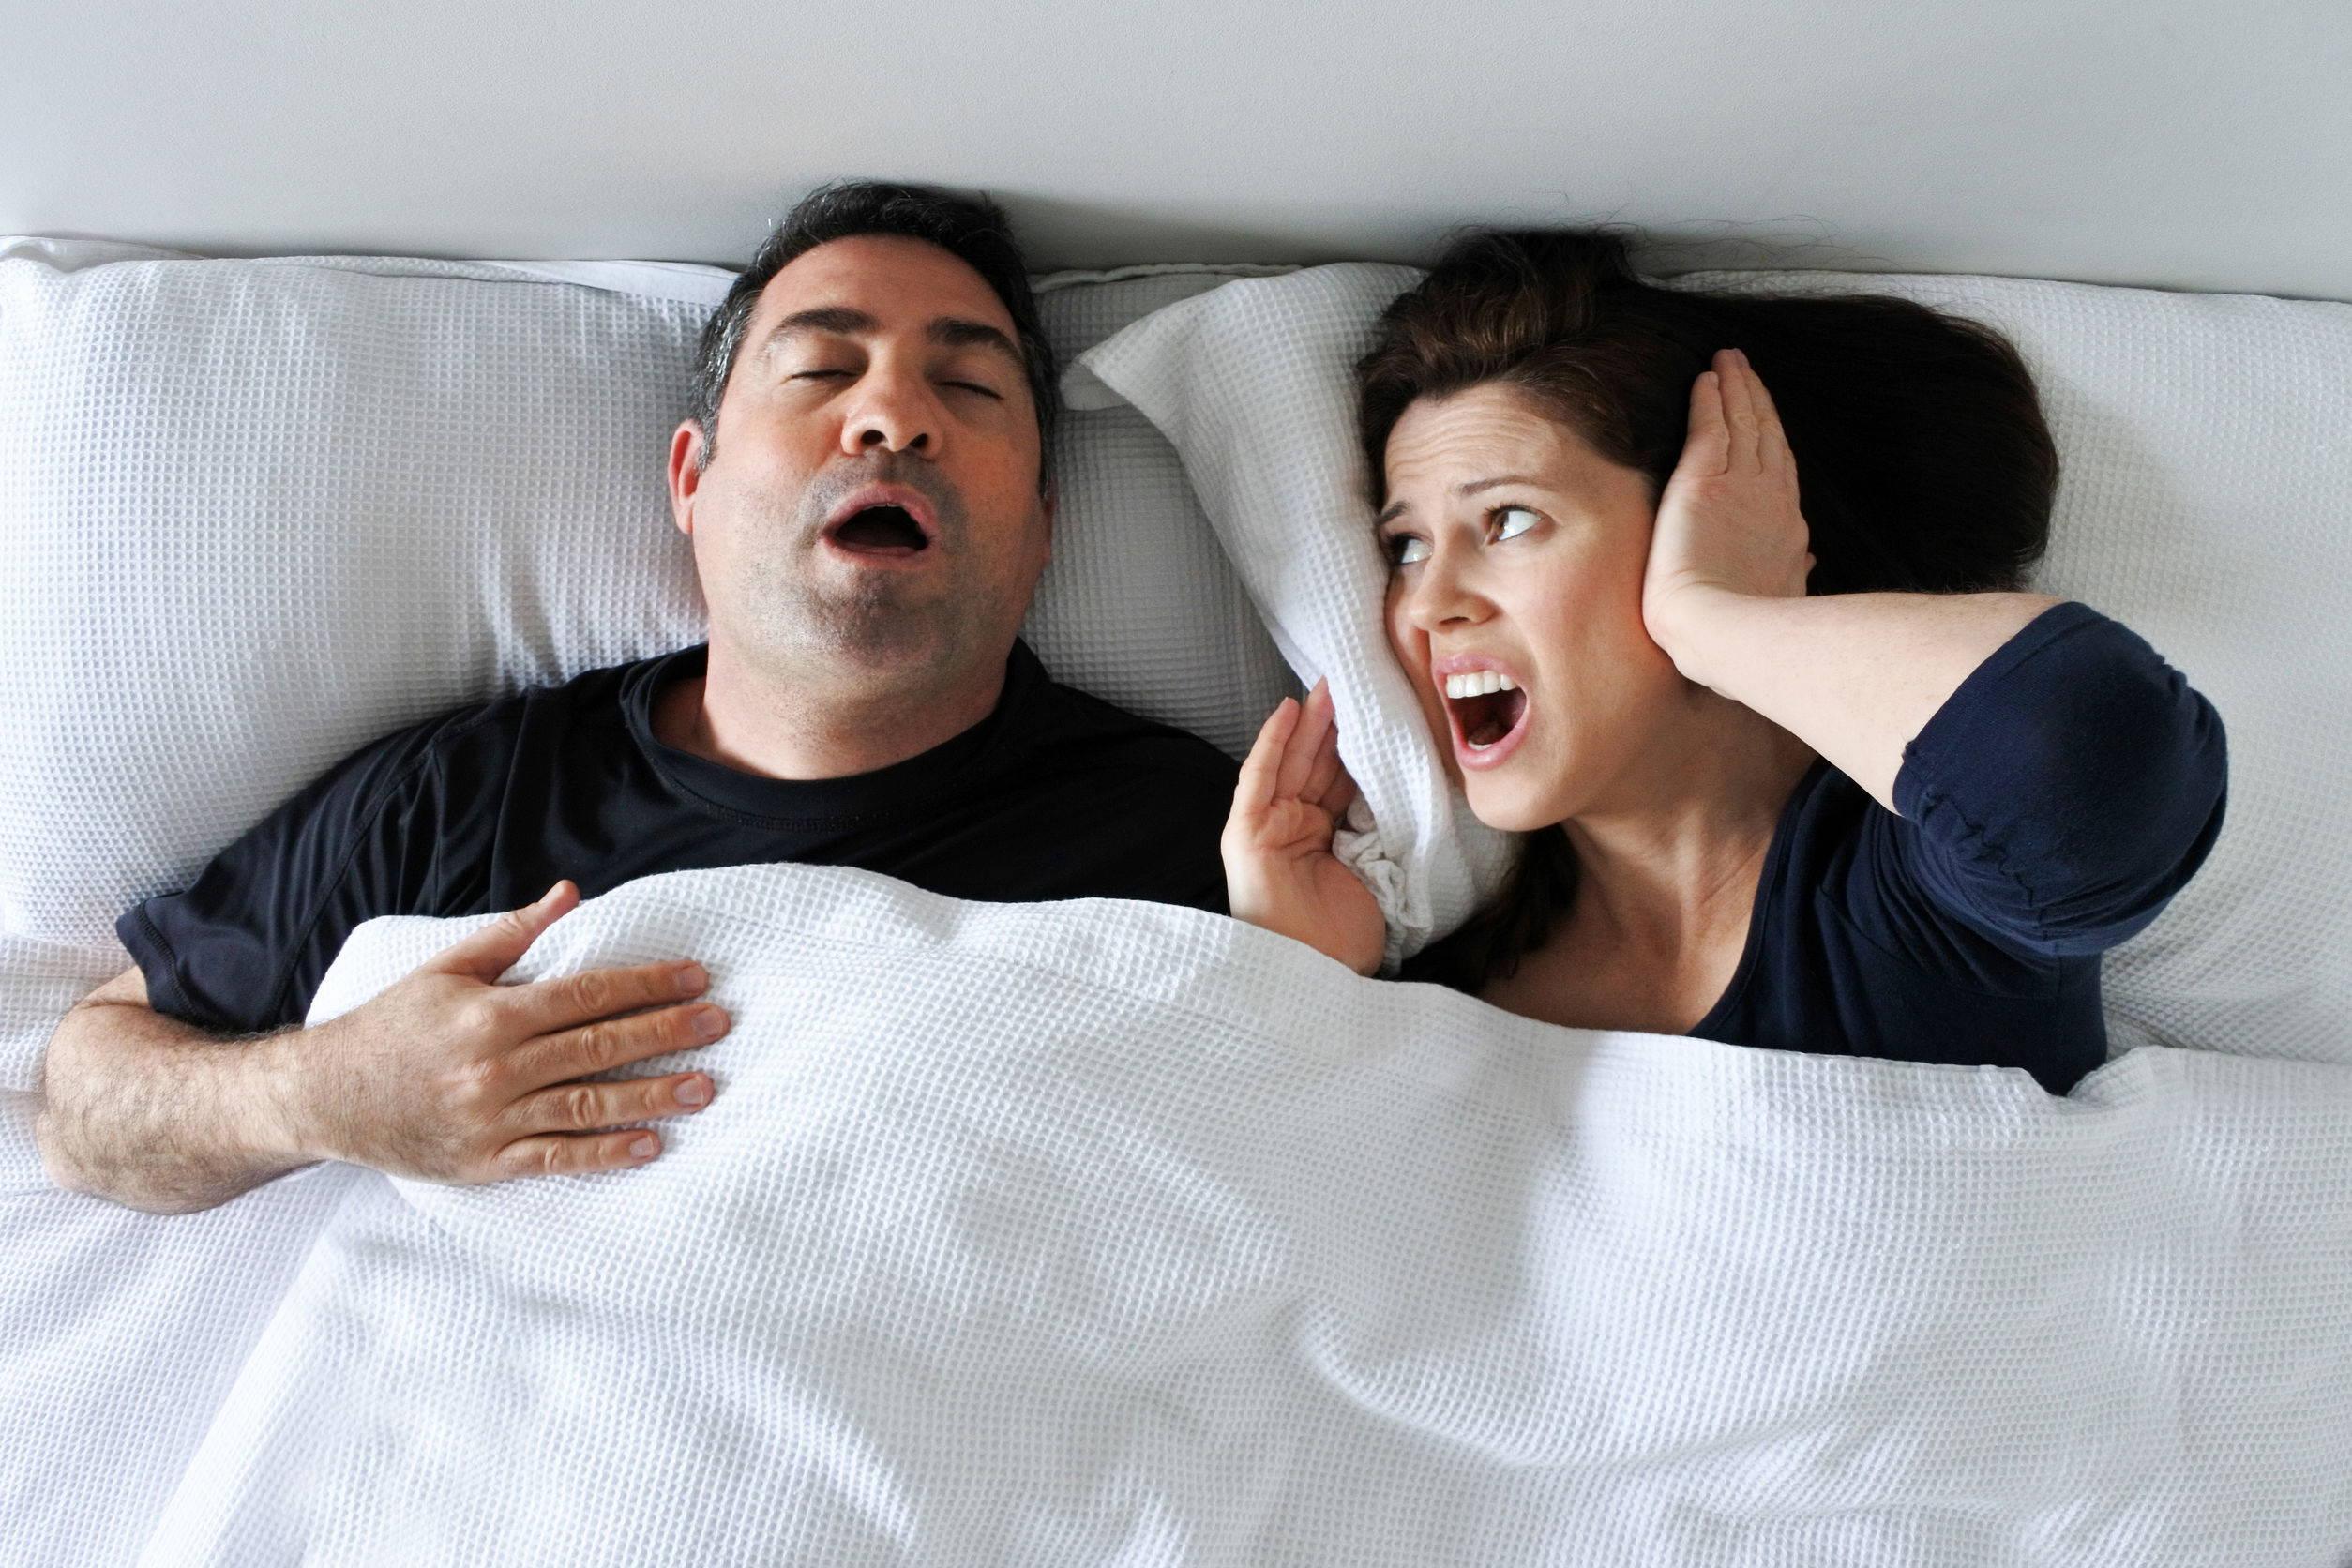 snoring bed partner